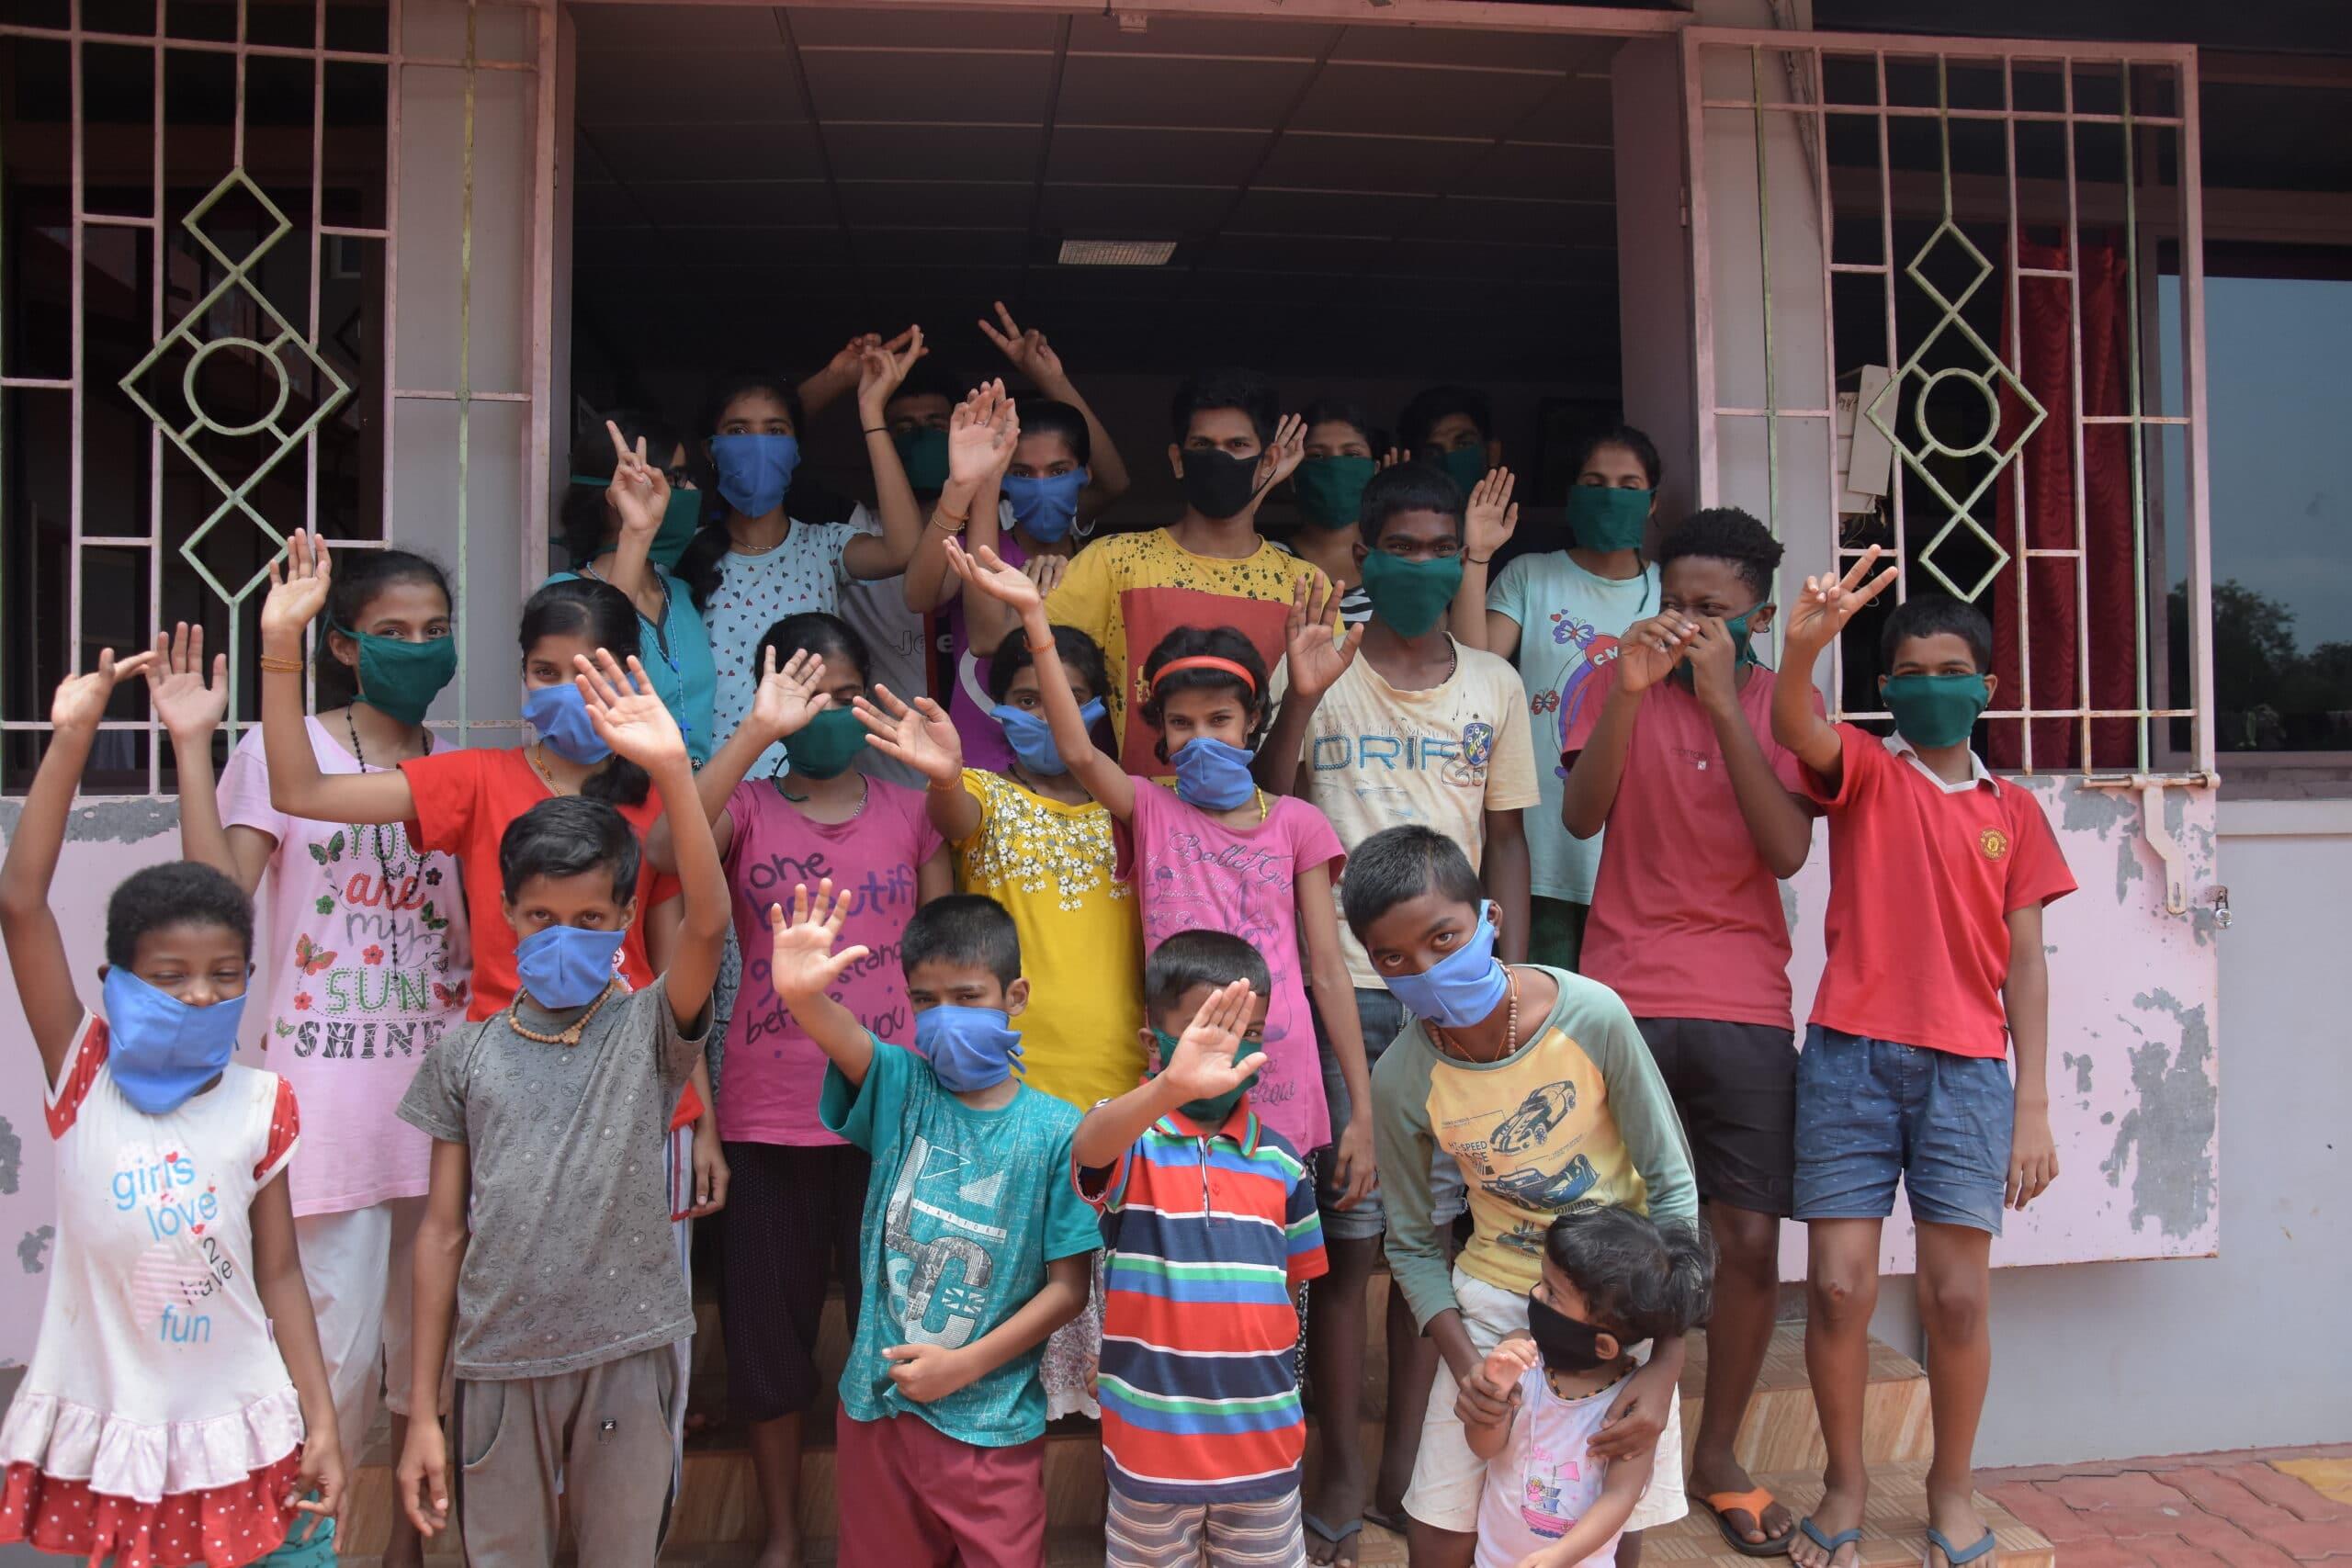 Sbírka z online koncertu je již v Indii